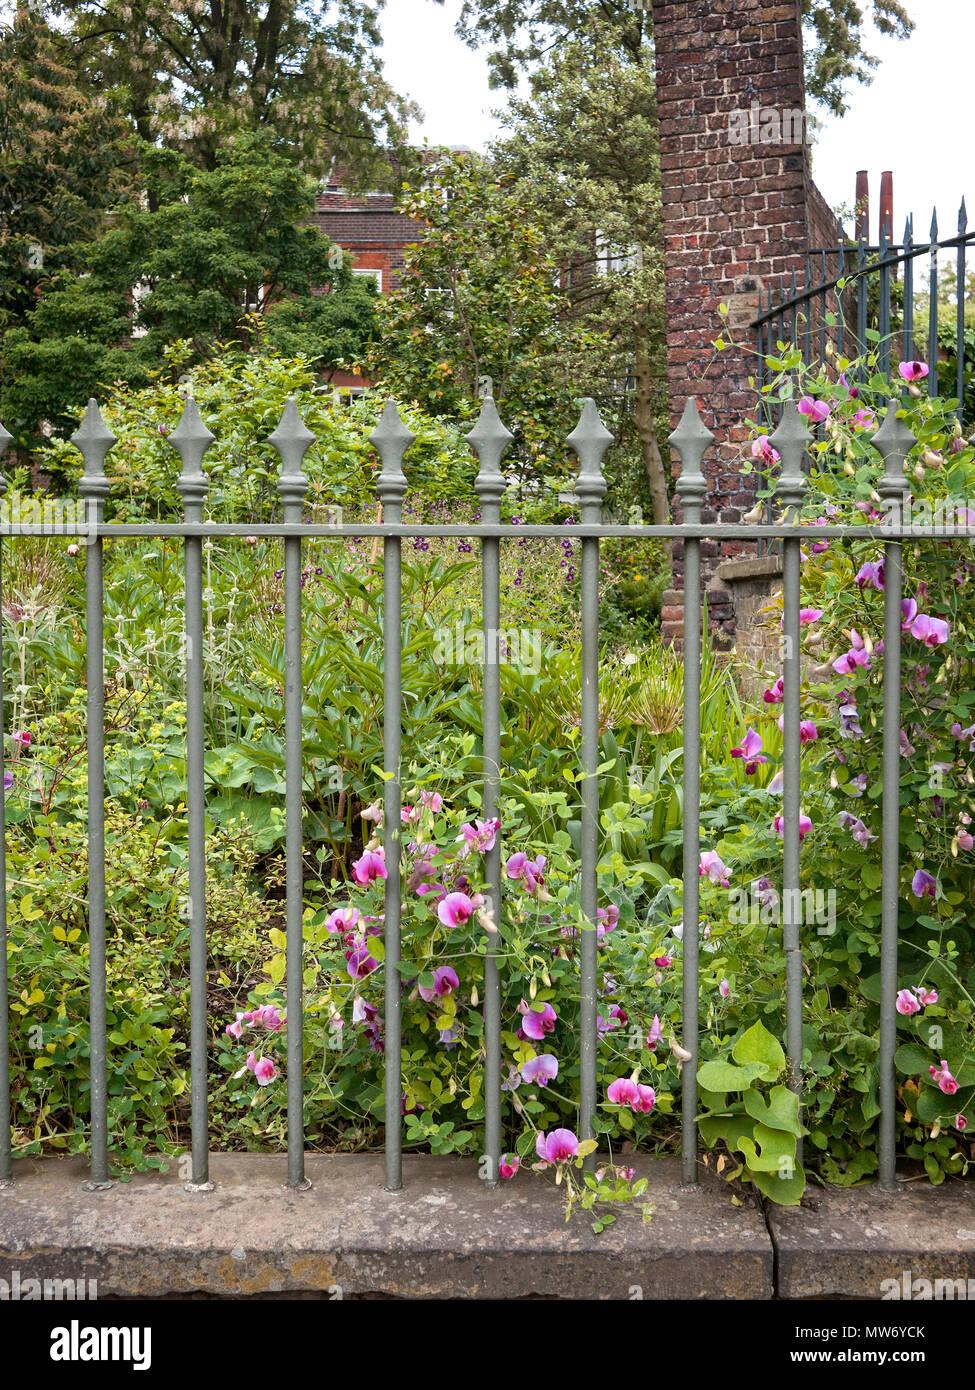 Cast Iron Garden Railings.   Stock Image